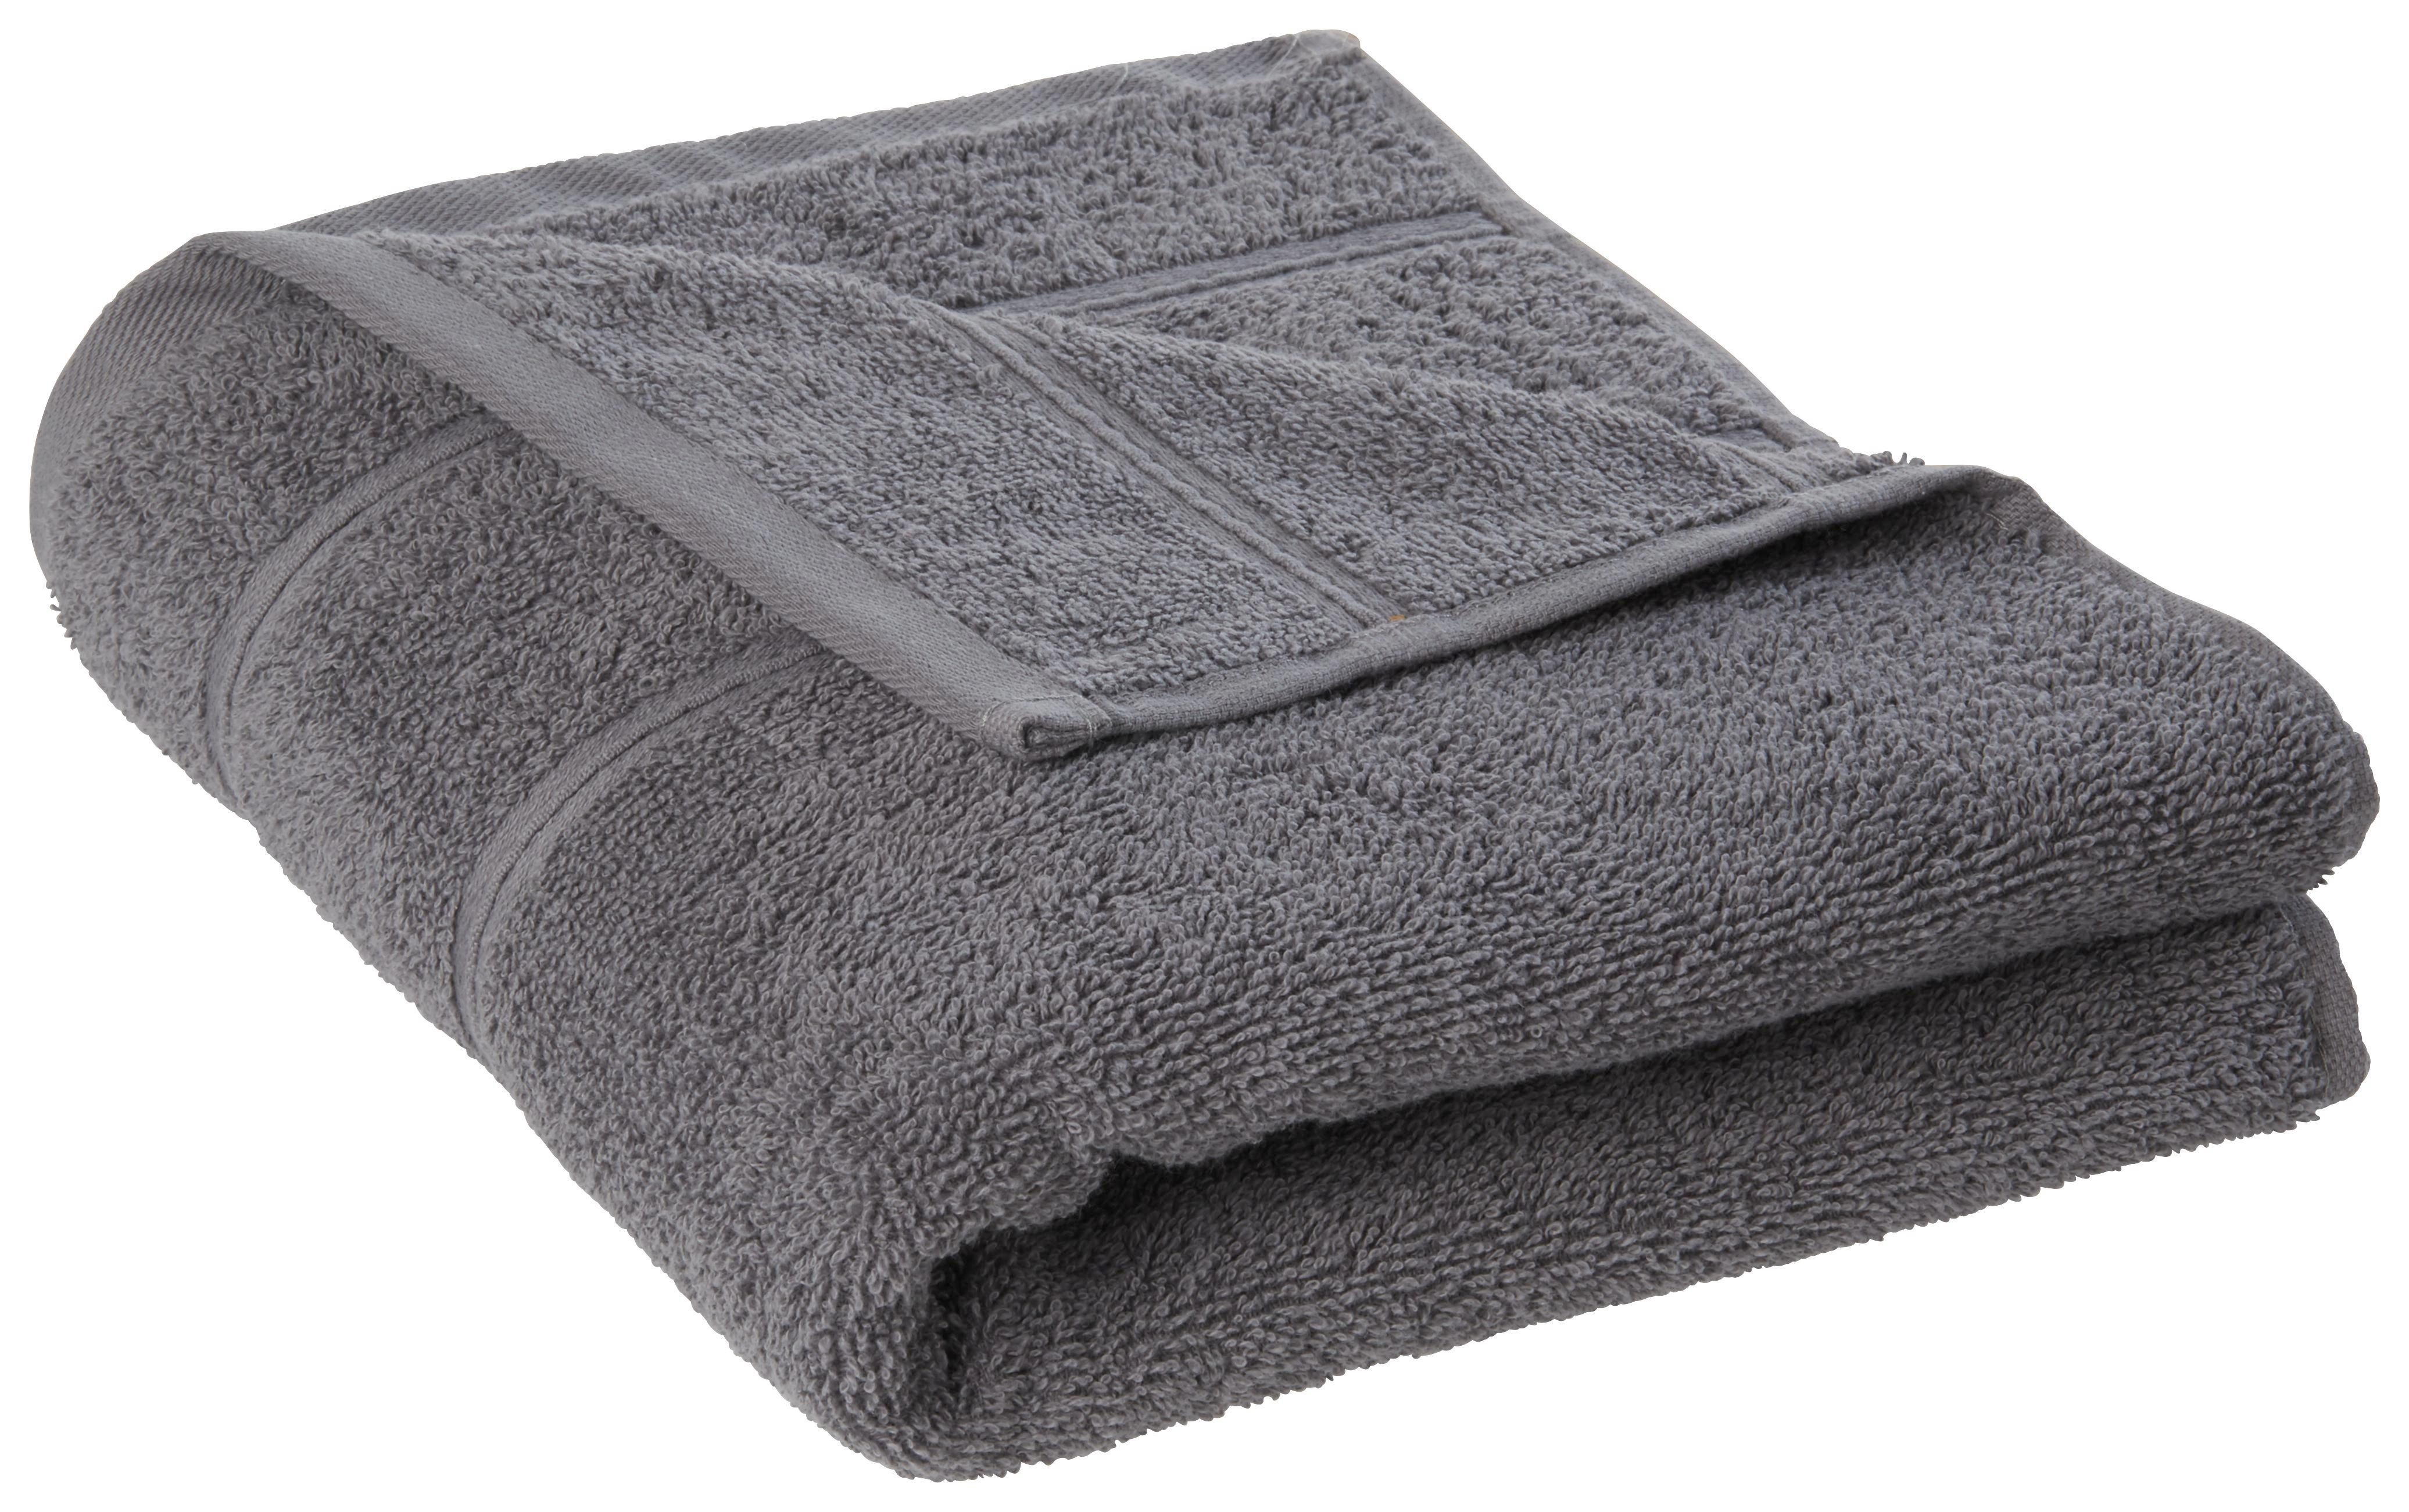 TÖRÖLKÖZŐ MELANIE - antracit, textil (50/100cm) - MÖMAX modern living